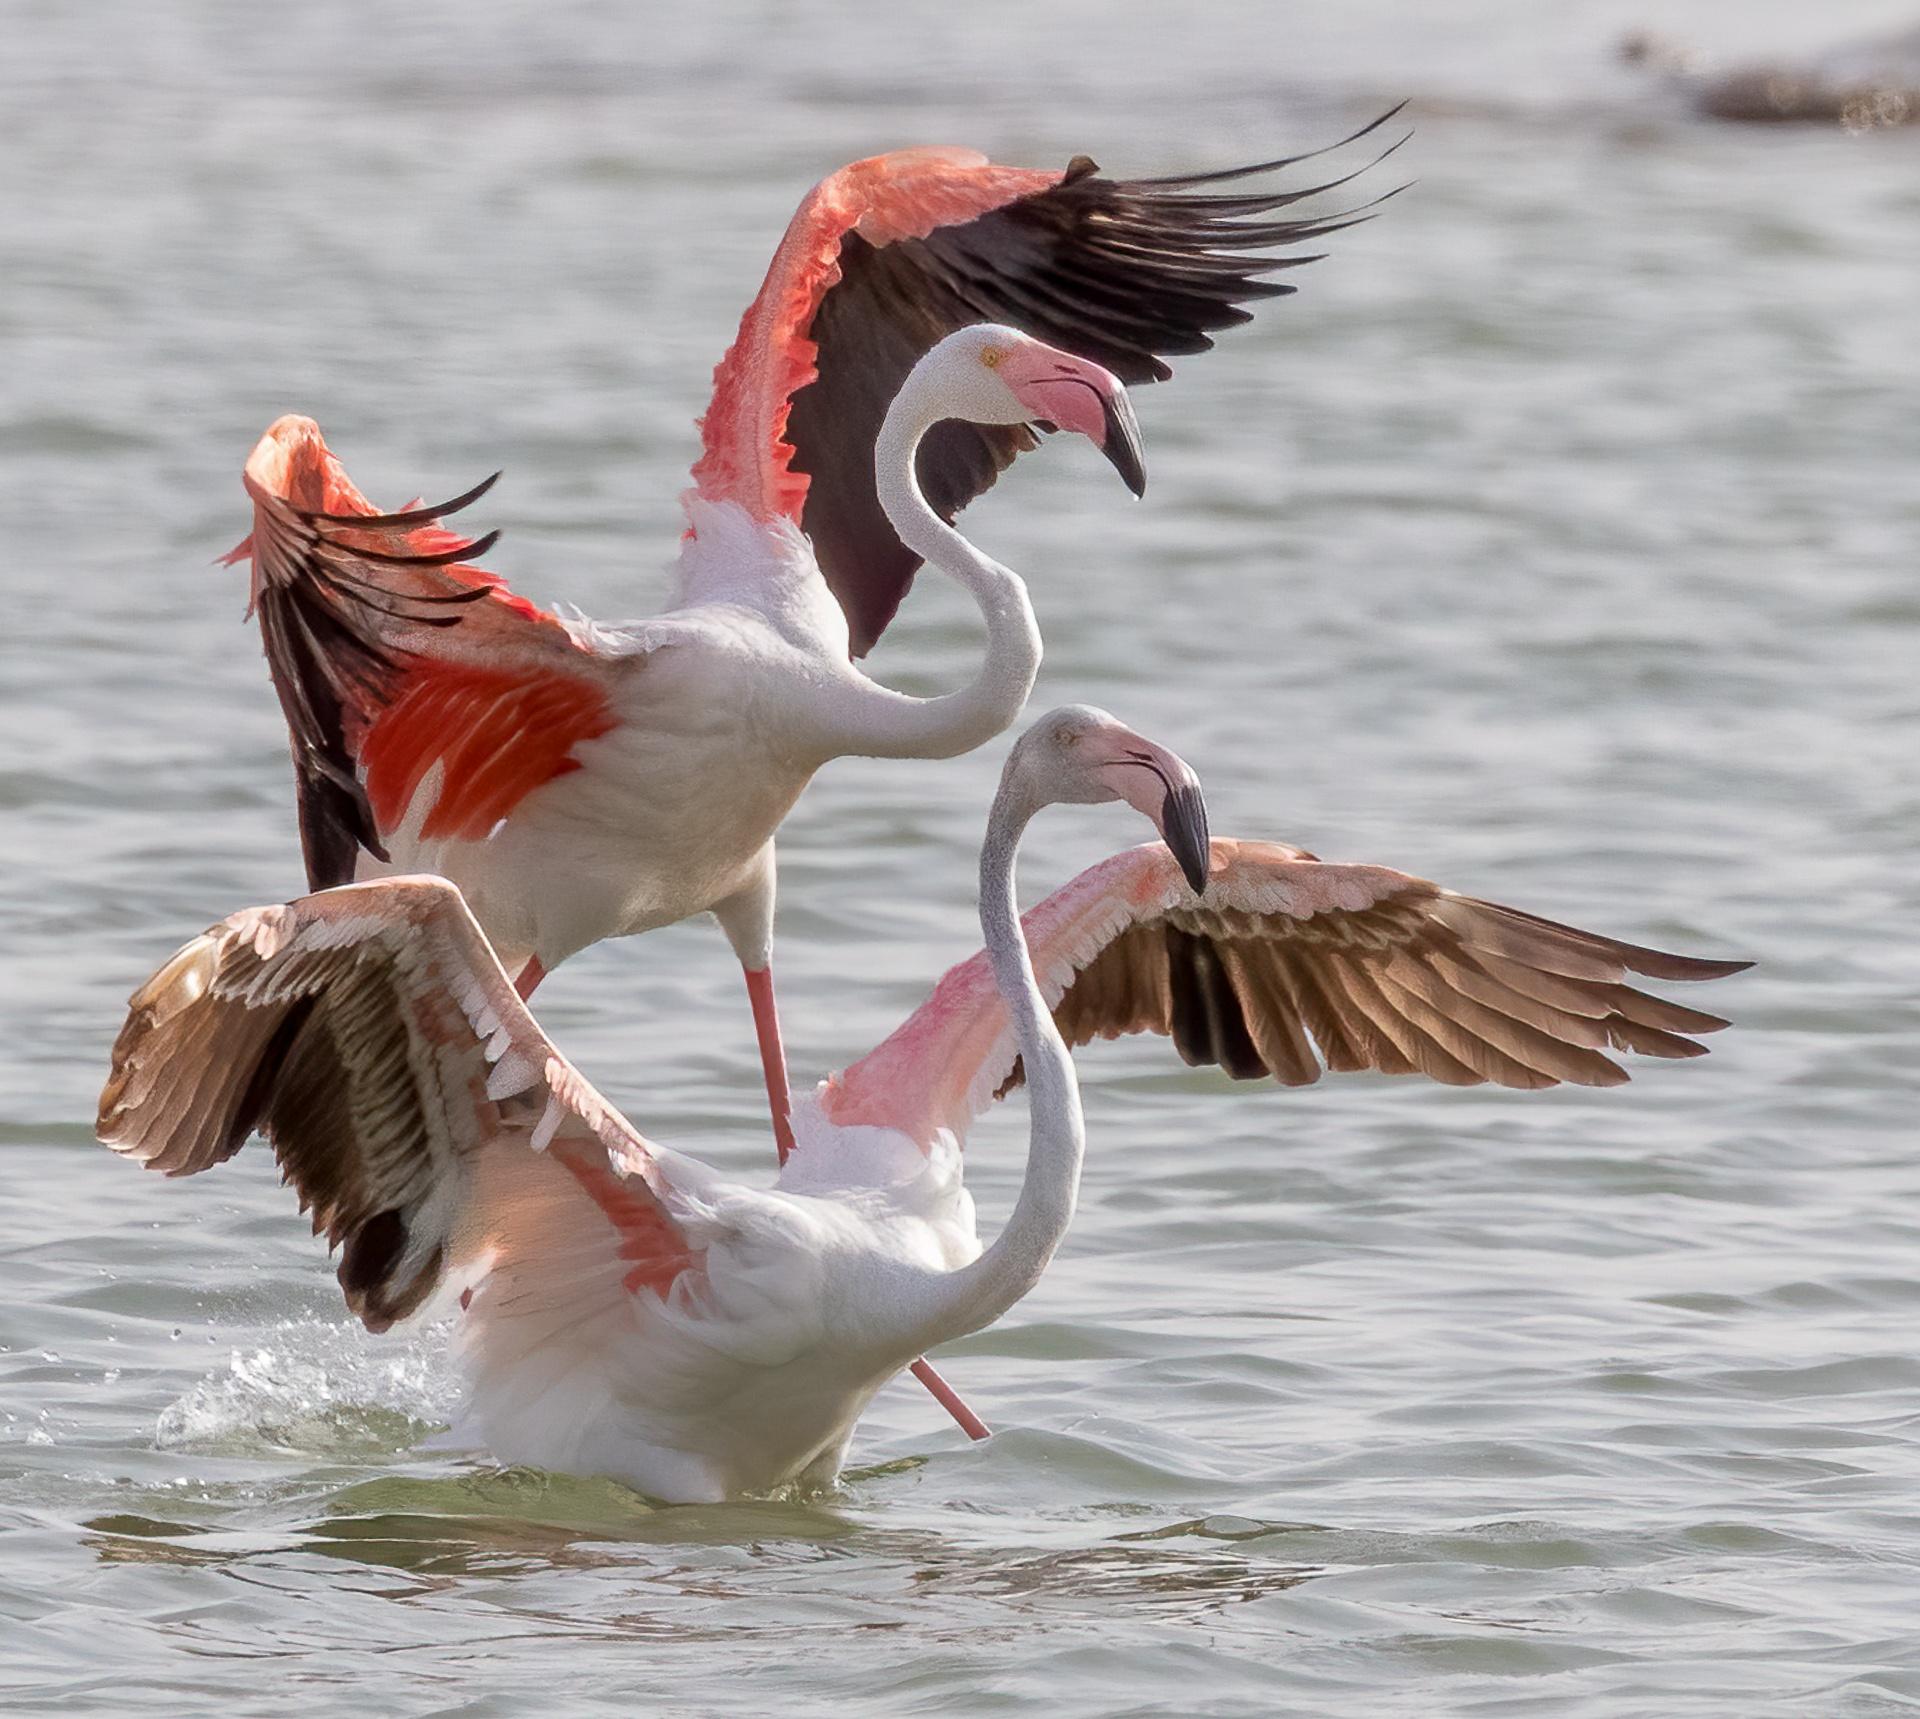 Flamingos landing in unison